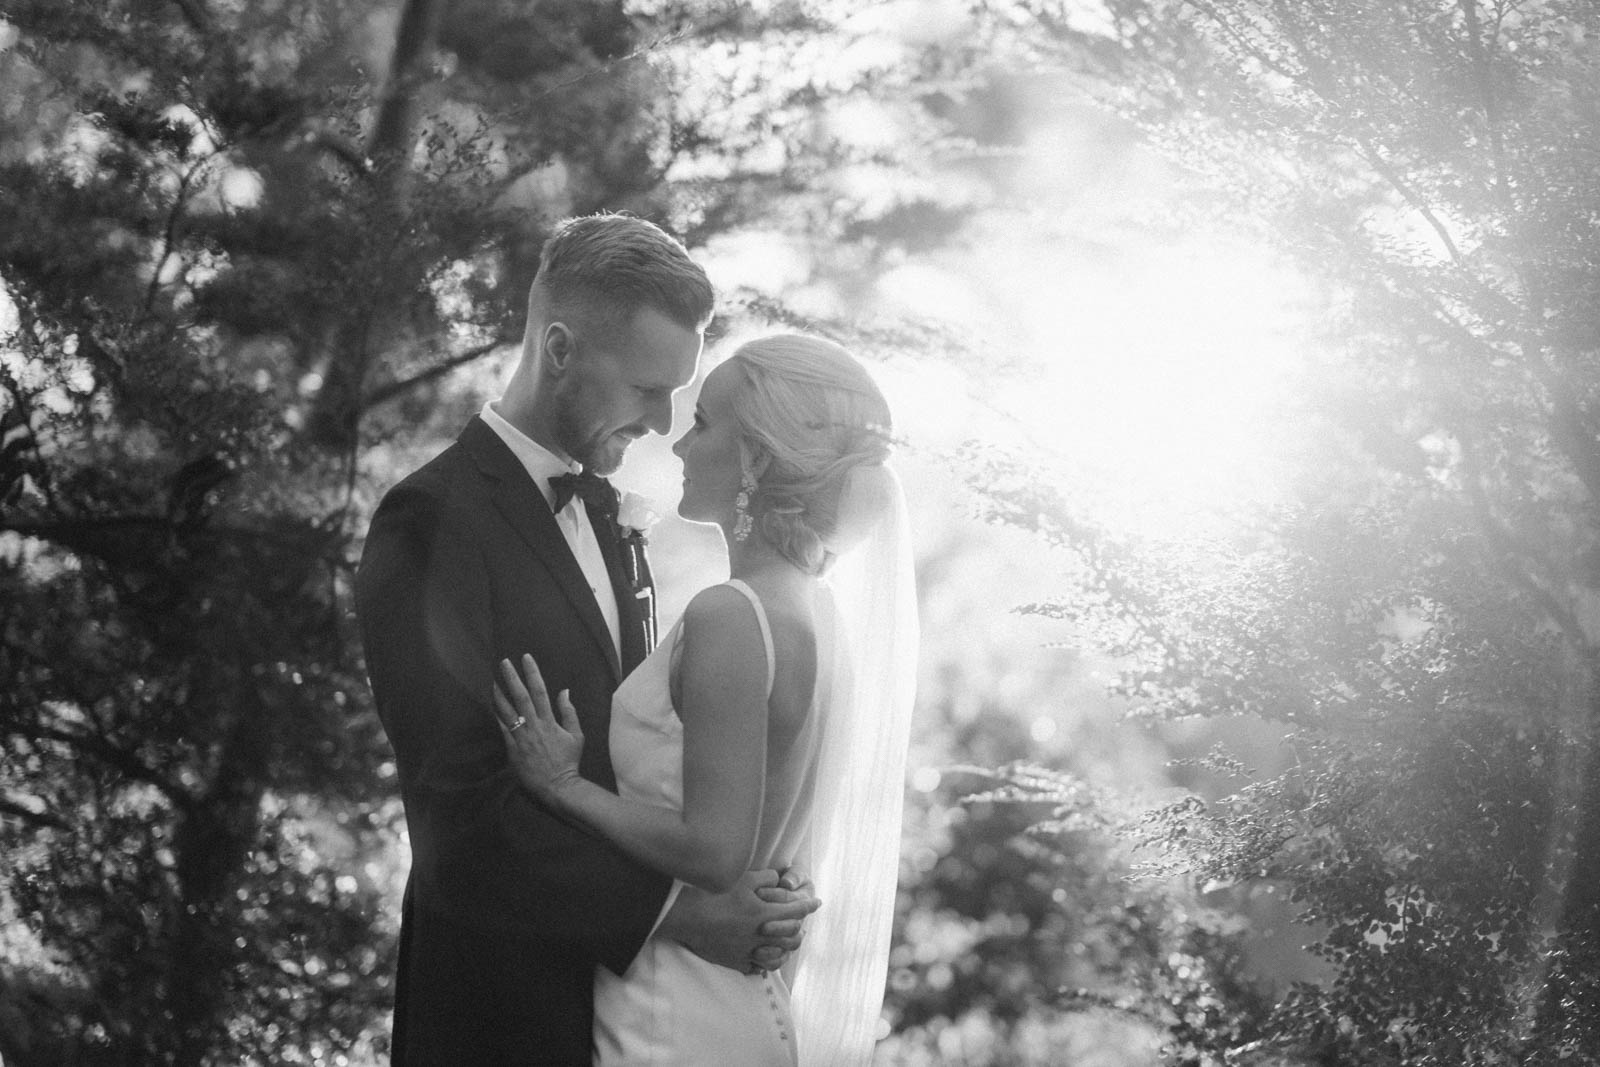 newfound-k-s-hilton-taupo-wedding-photographer-083